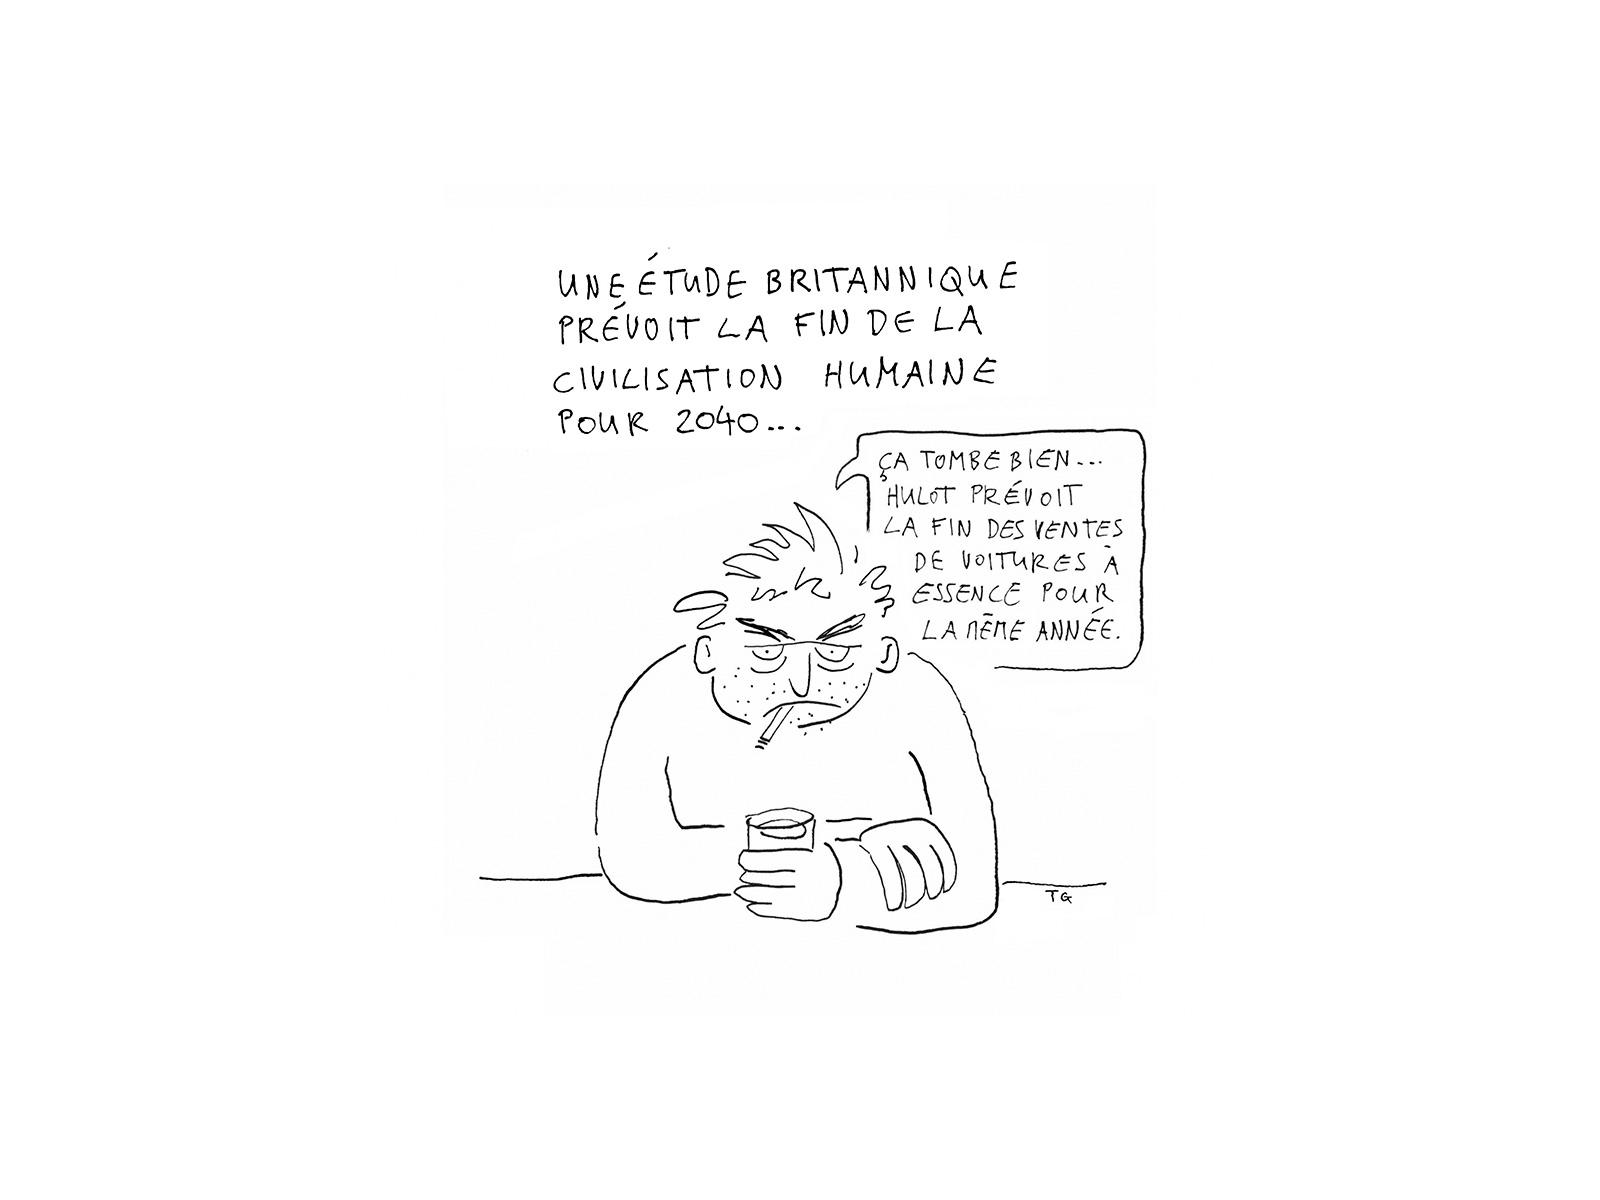 Hulot.jpg